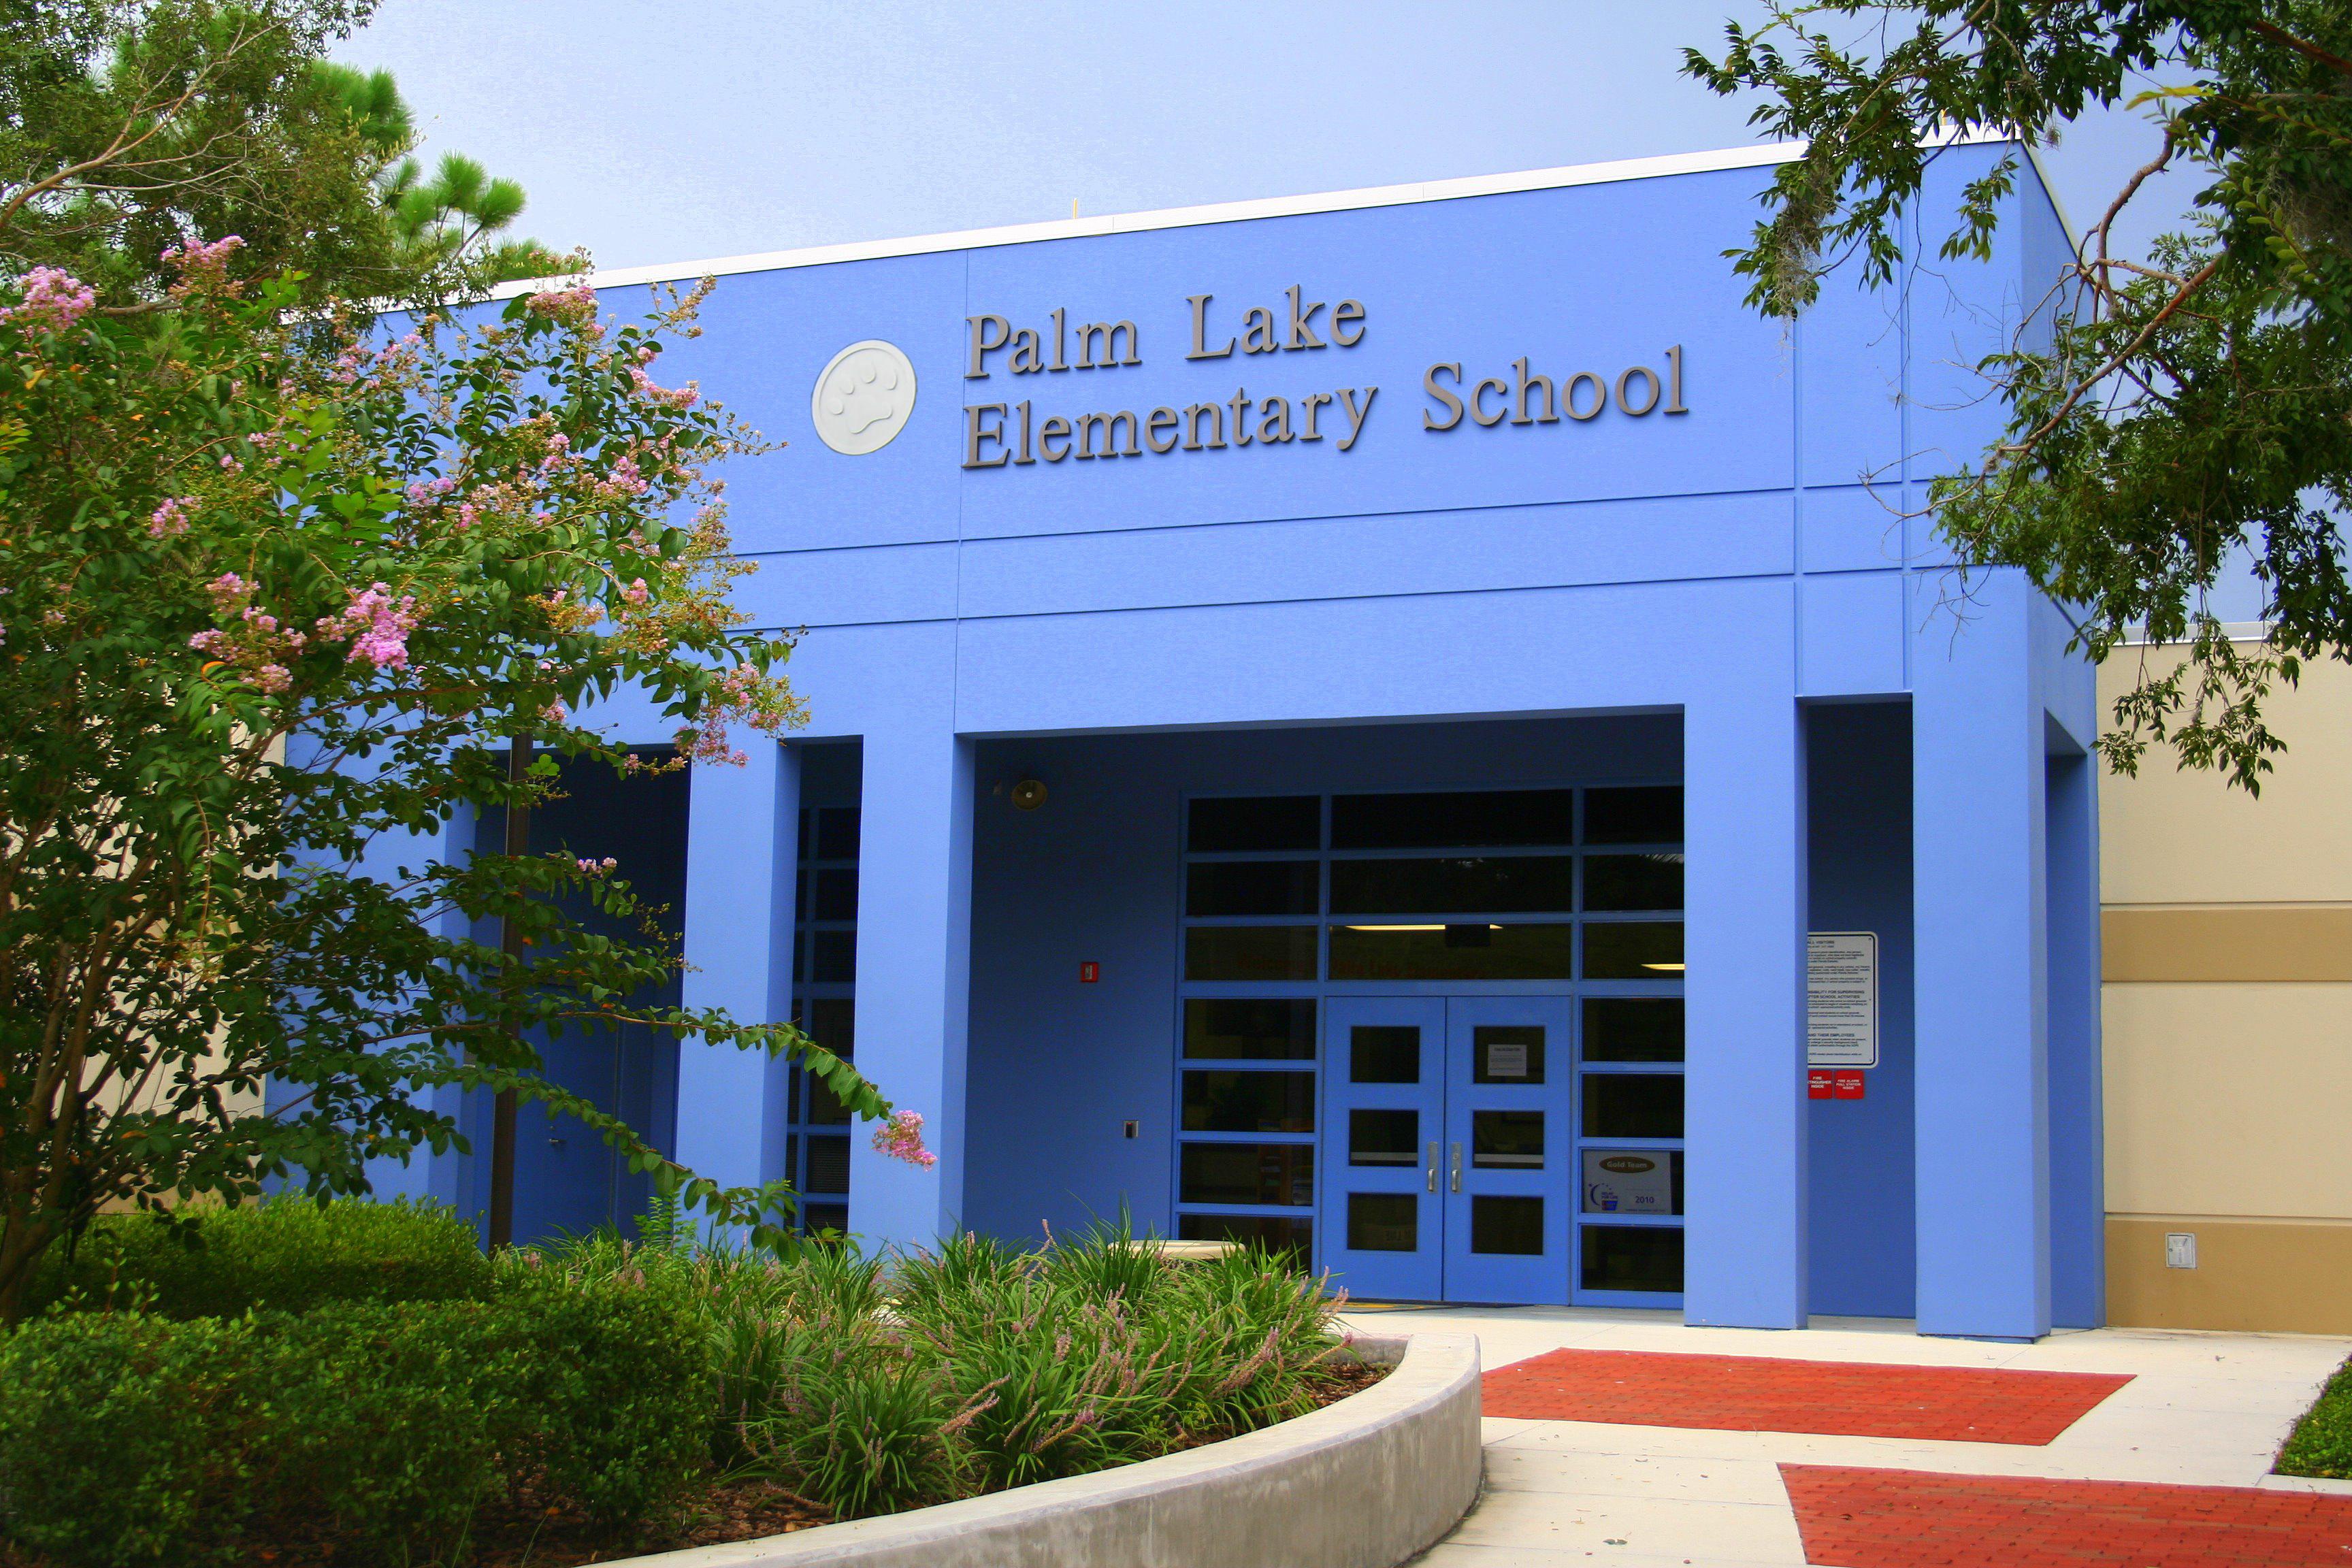 Palm Lake Elementary